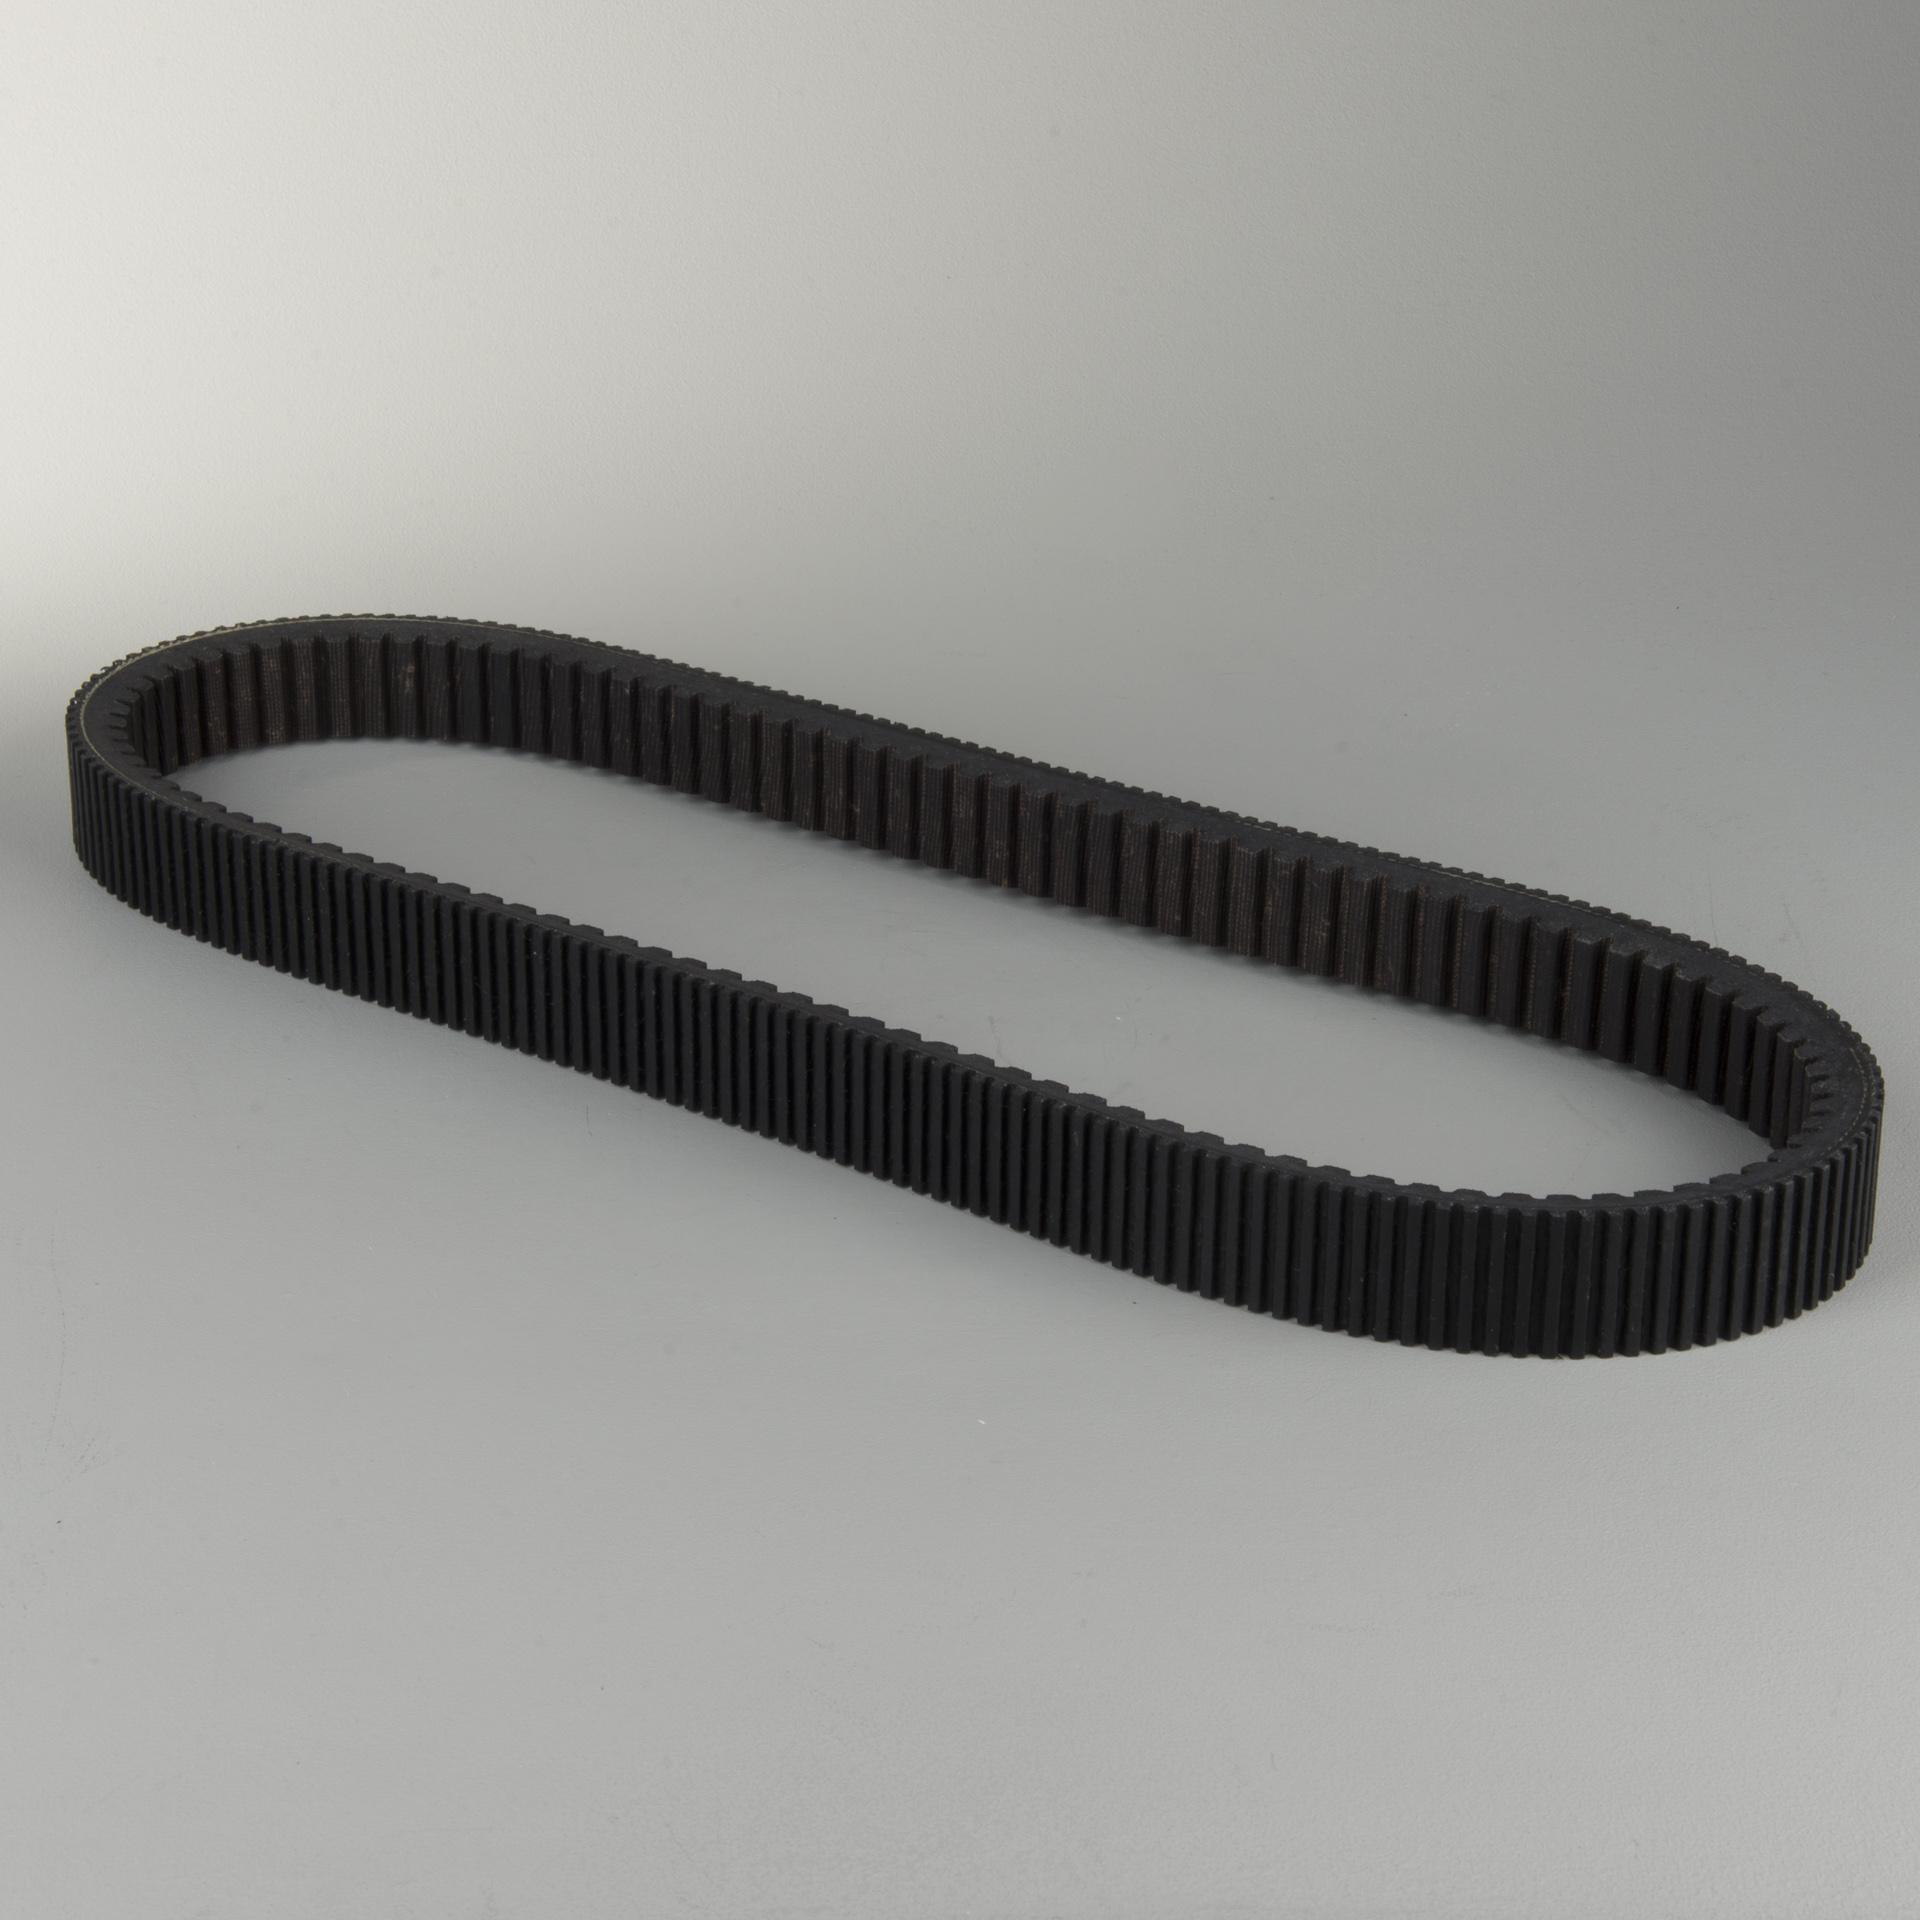 Dayco Snowmobile Belt Max 1131